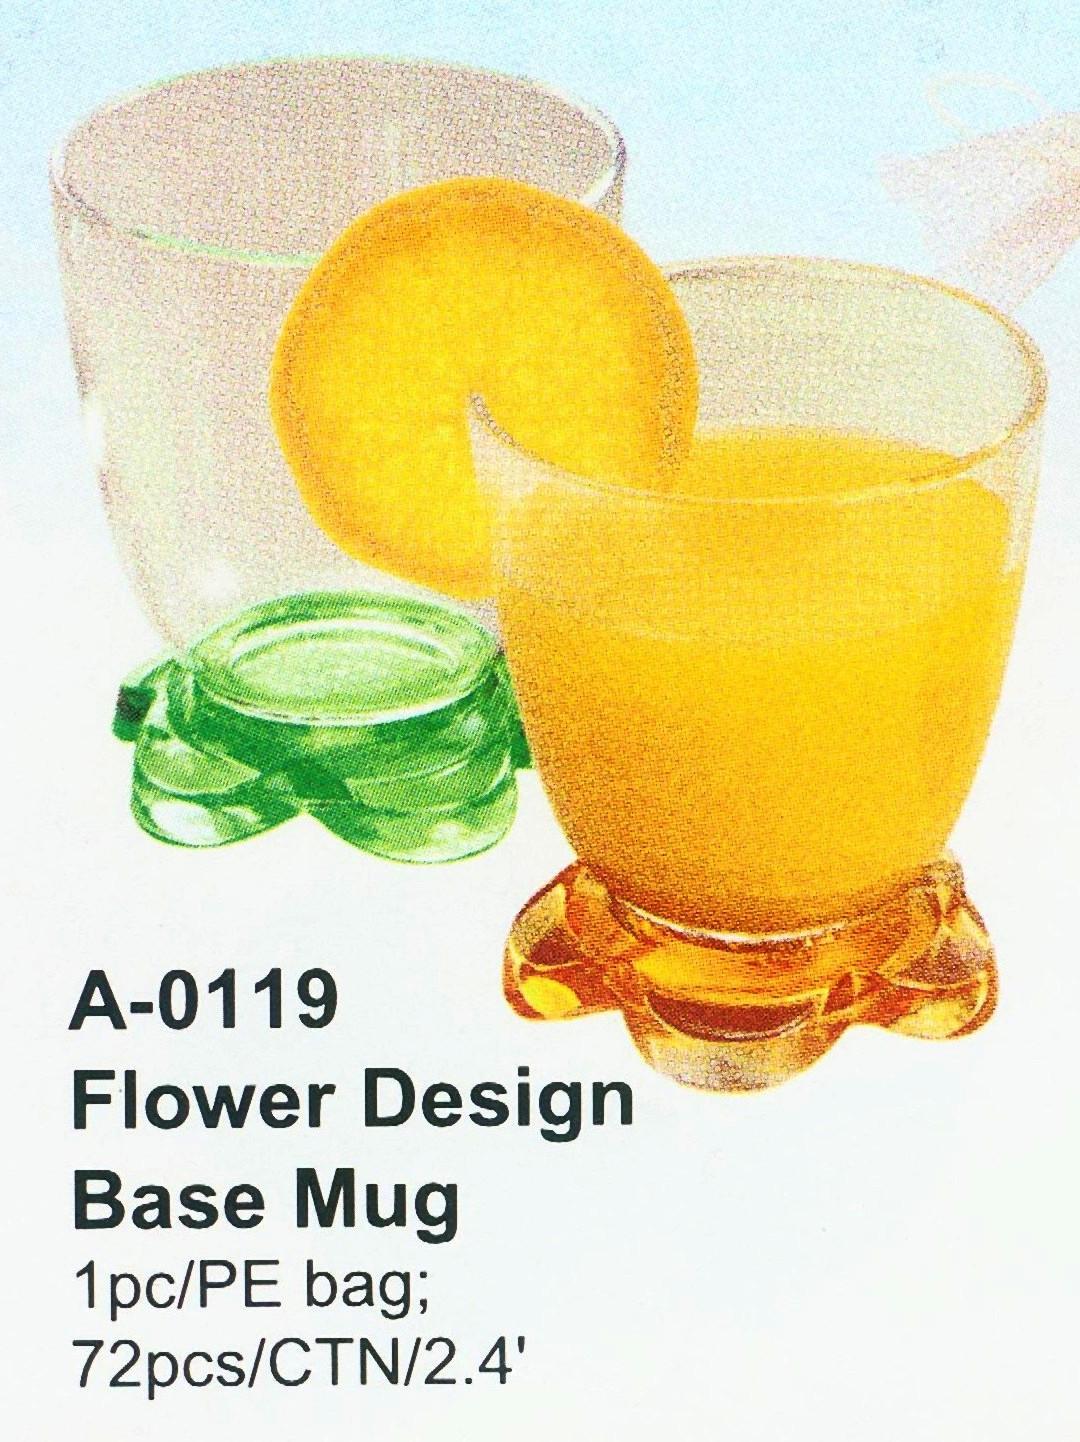 Flower Design Base Mug (Цветочный дизайн базы Кружка)